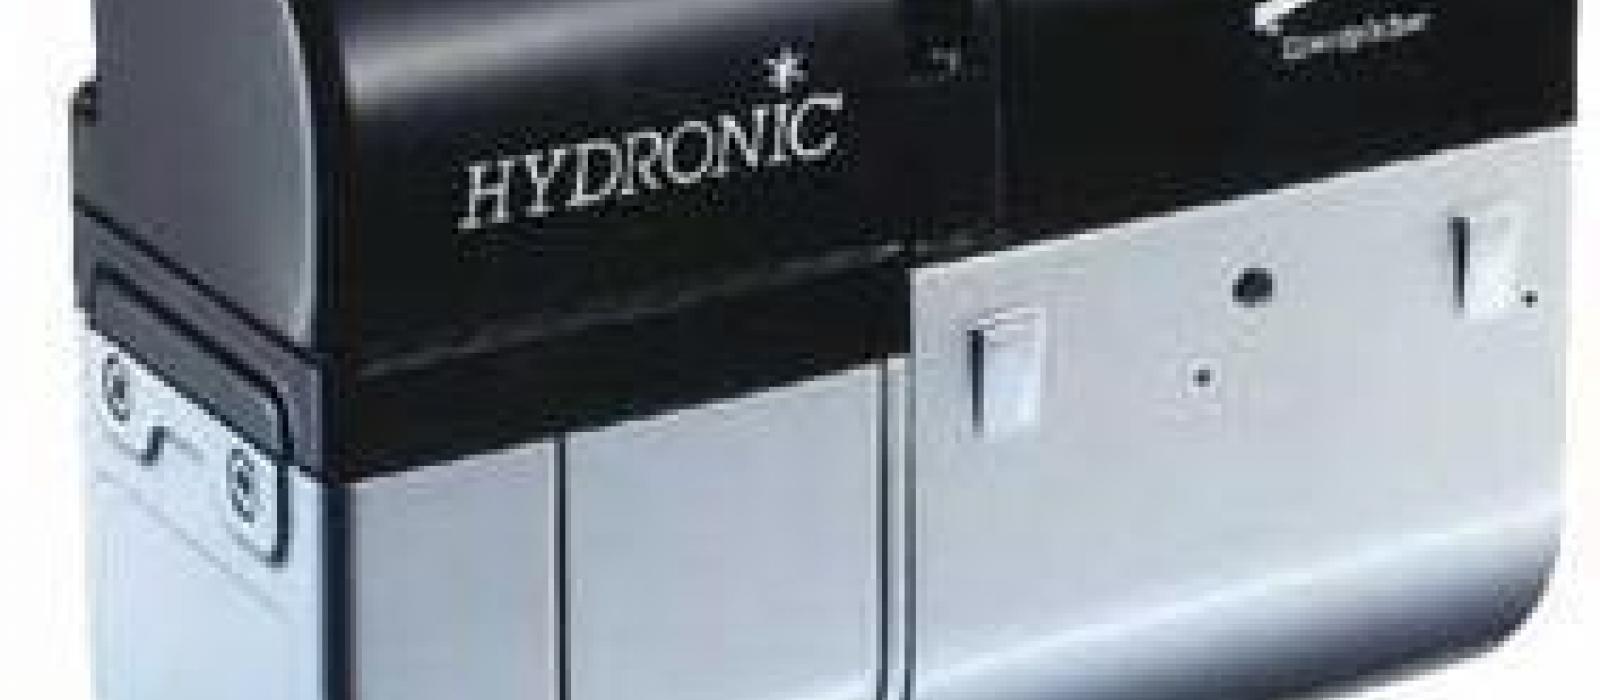 chauffage eau eberspacher hydronic vente chauffage autonome auto. Black Bedroom Furniture Sets. Home Design Ideas